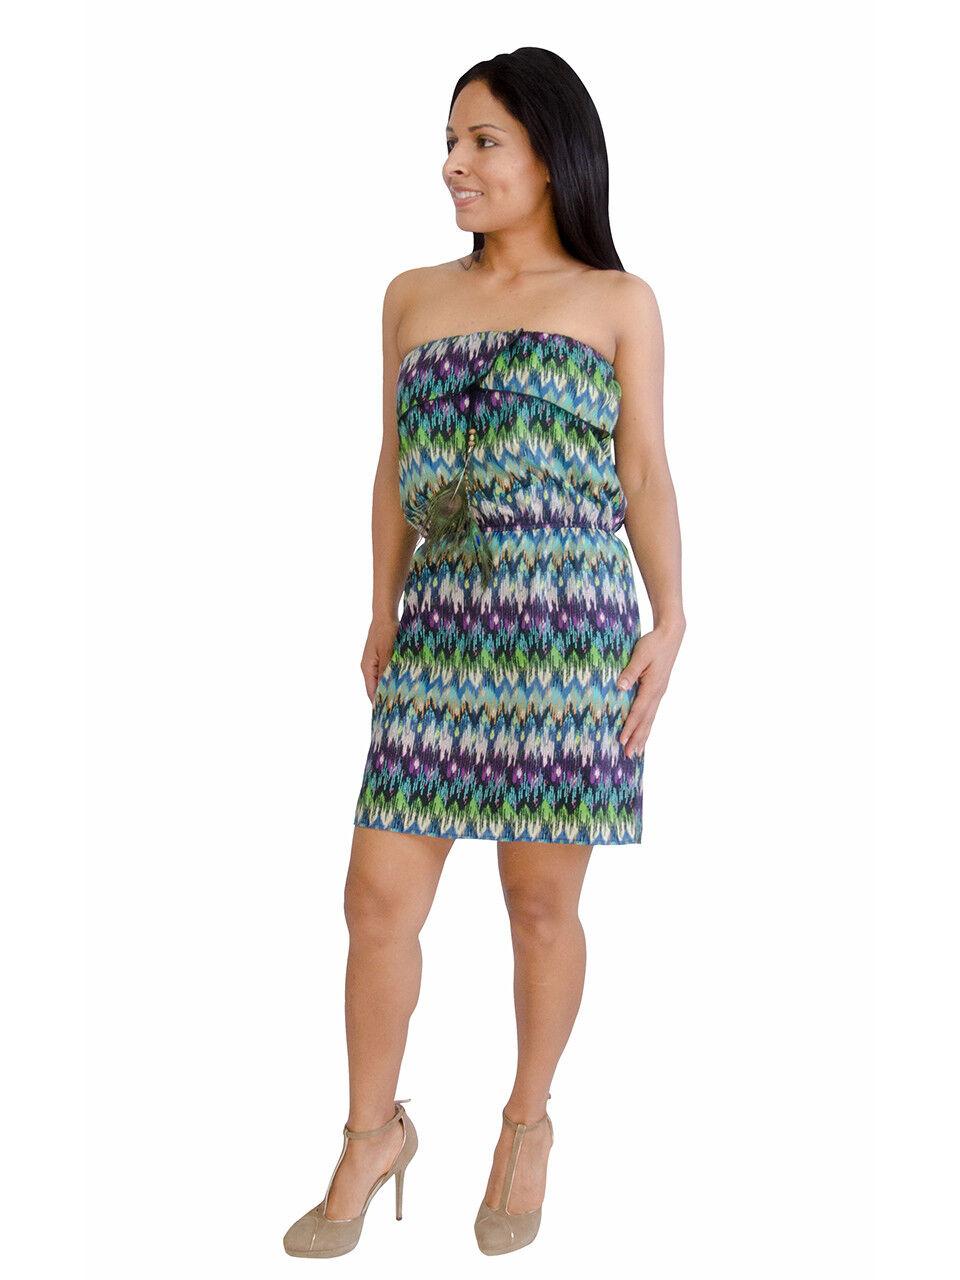 Dress - Peacock Feather Dress